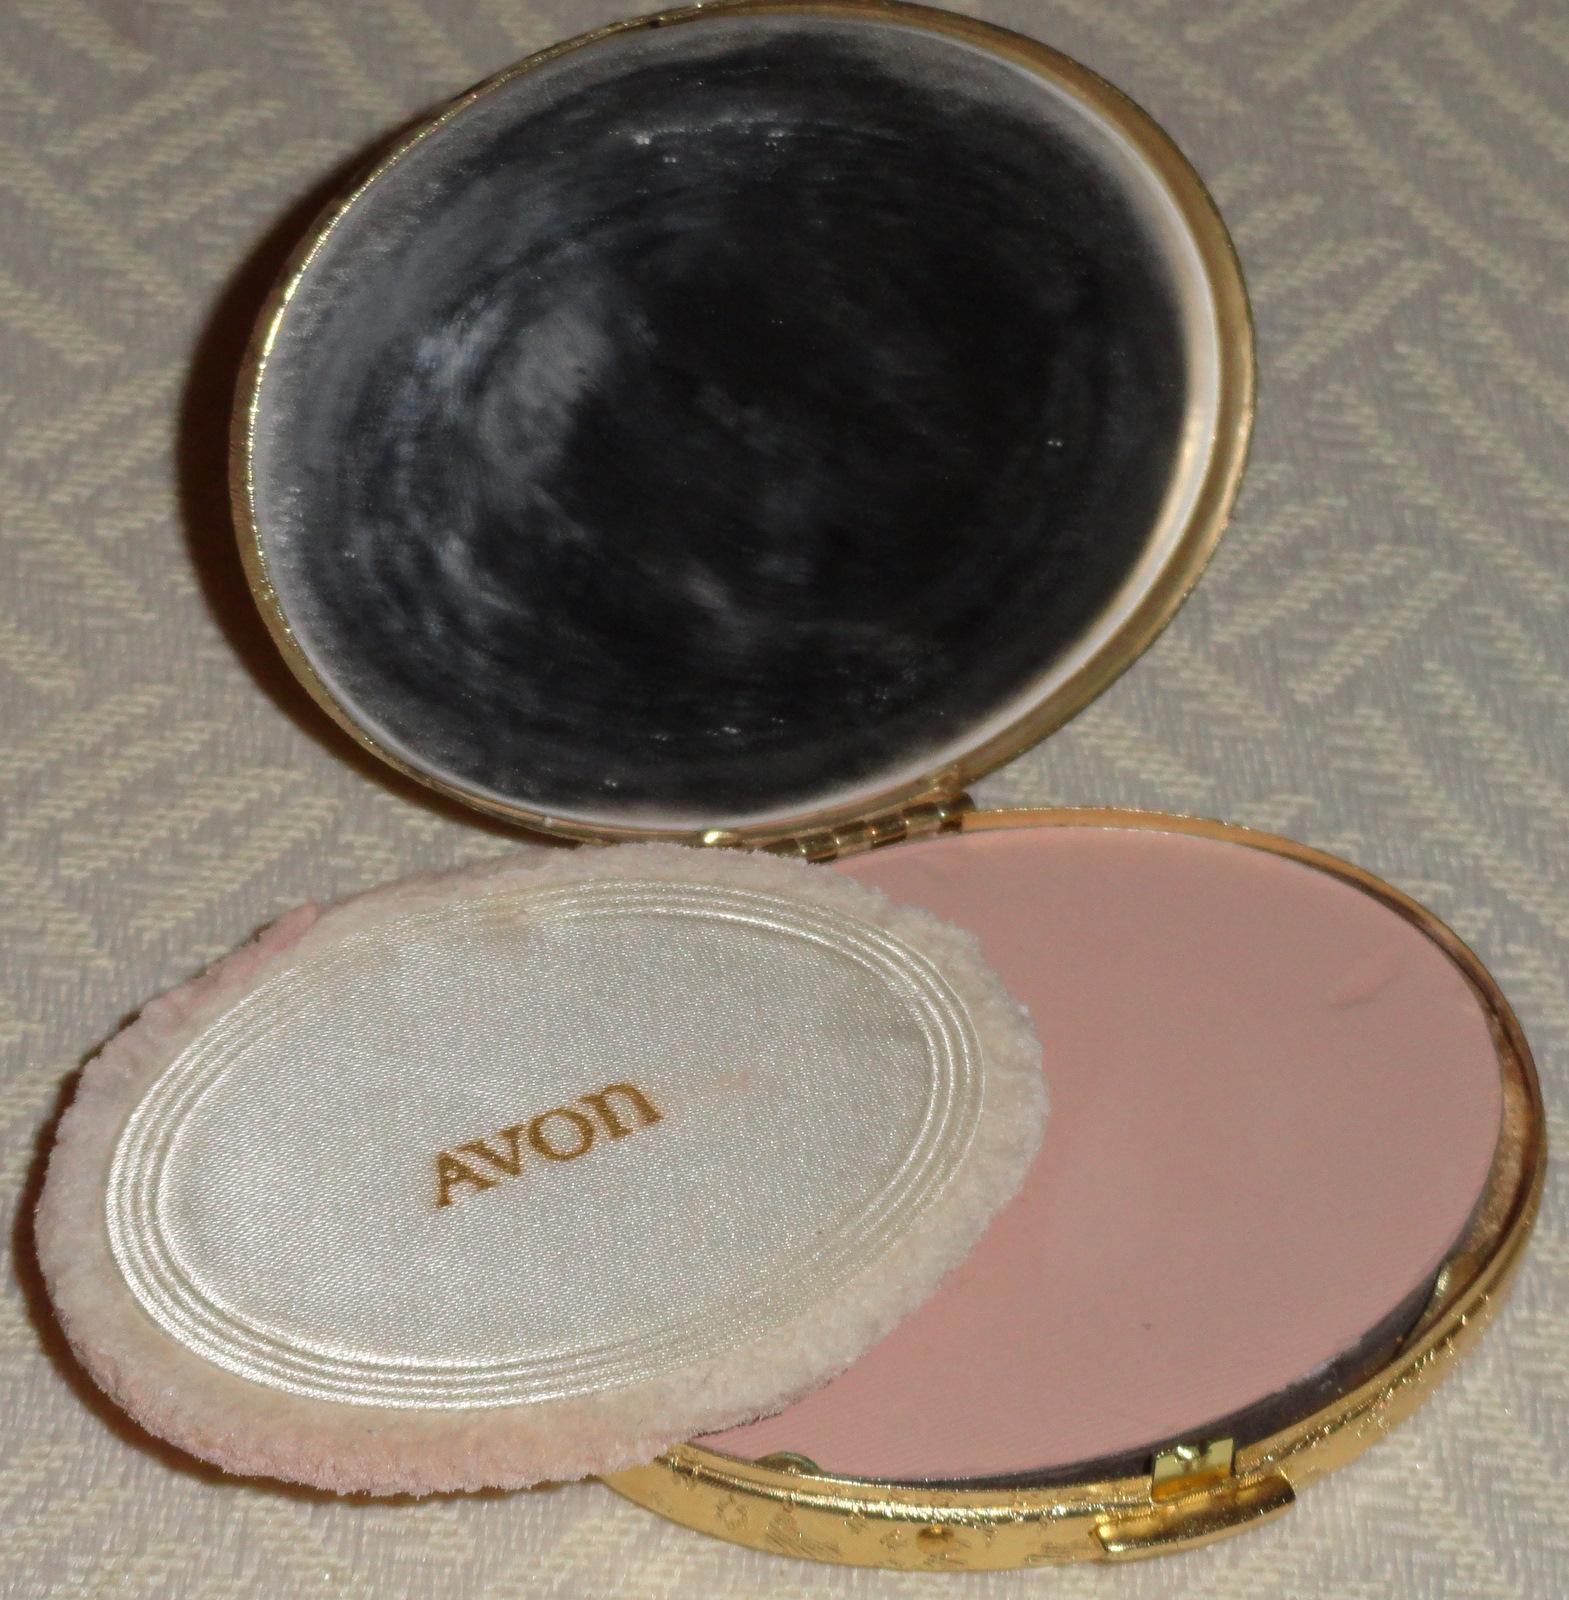 Makeup & Mutts: Vintage Makeup - Powder Keg Compacts